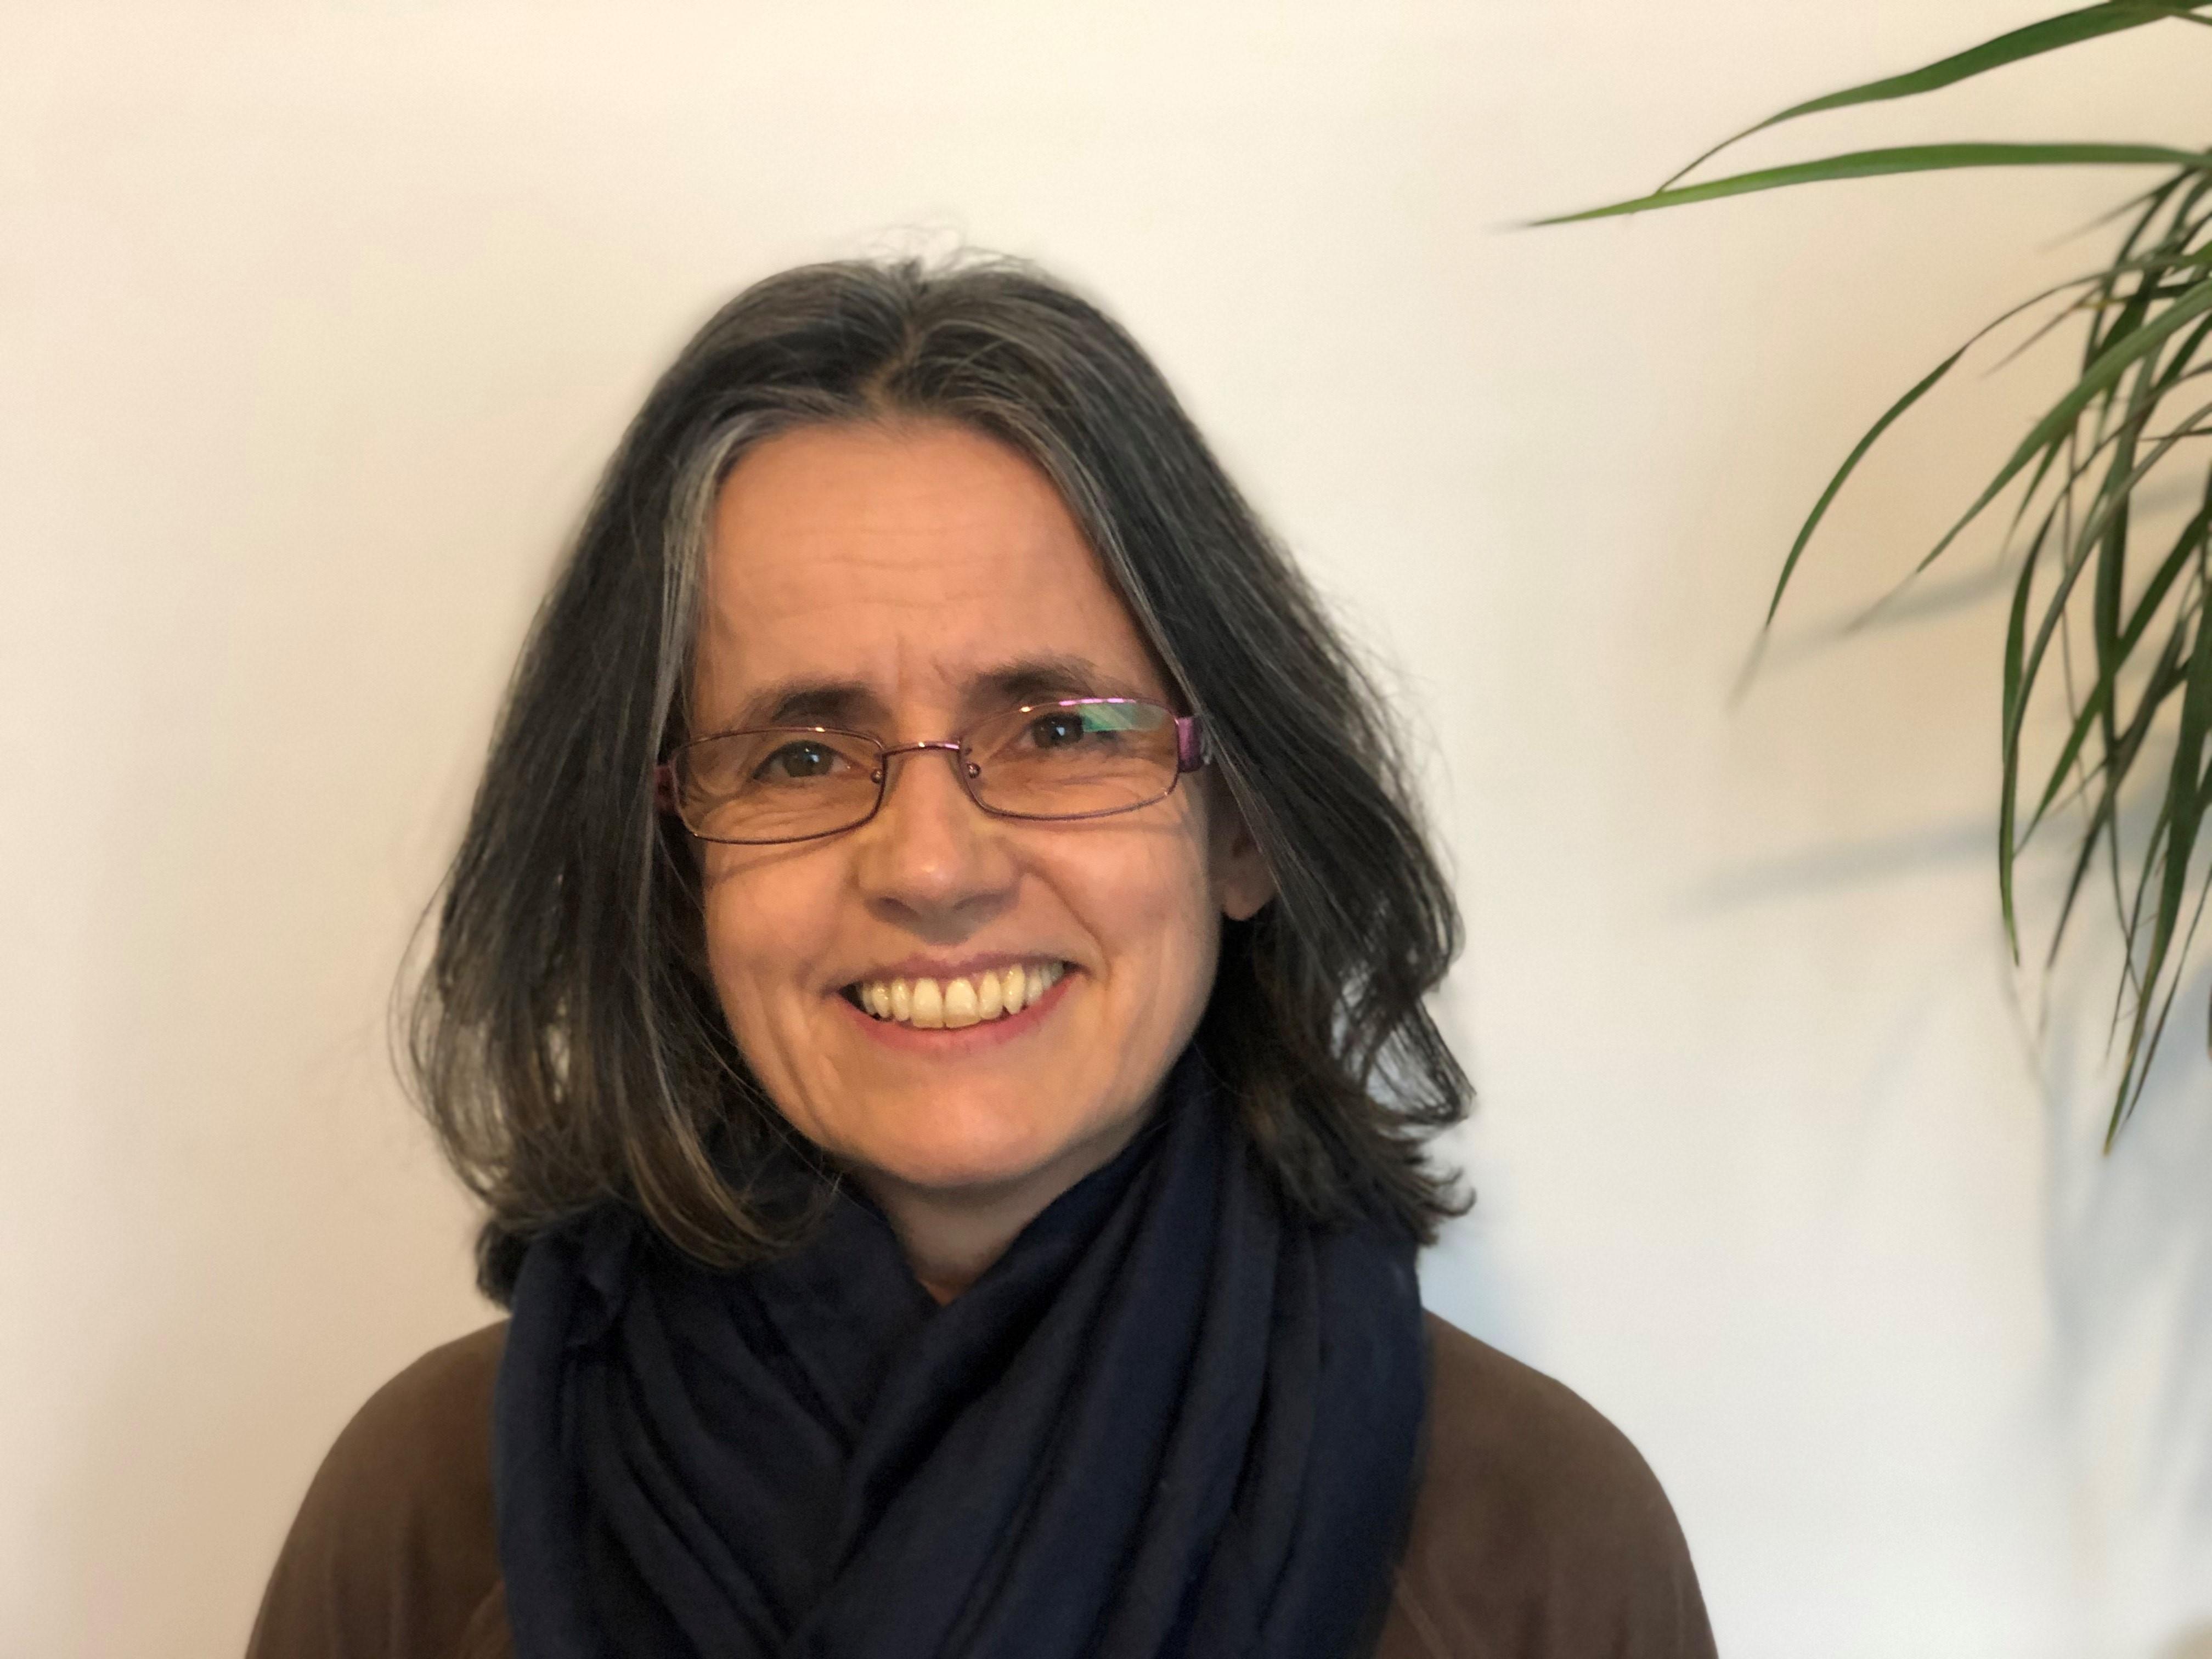 Karen Hulme